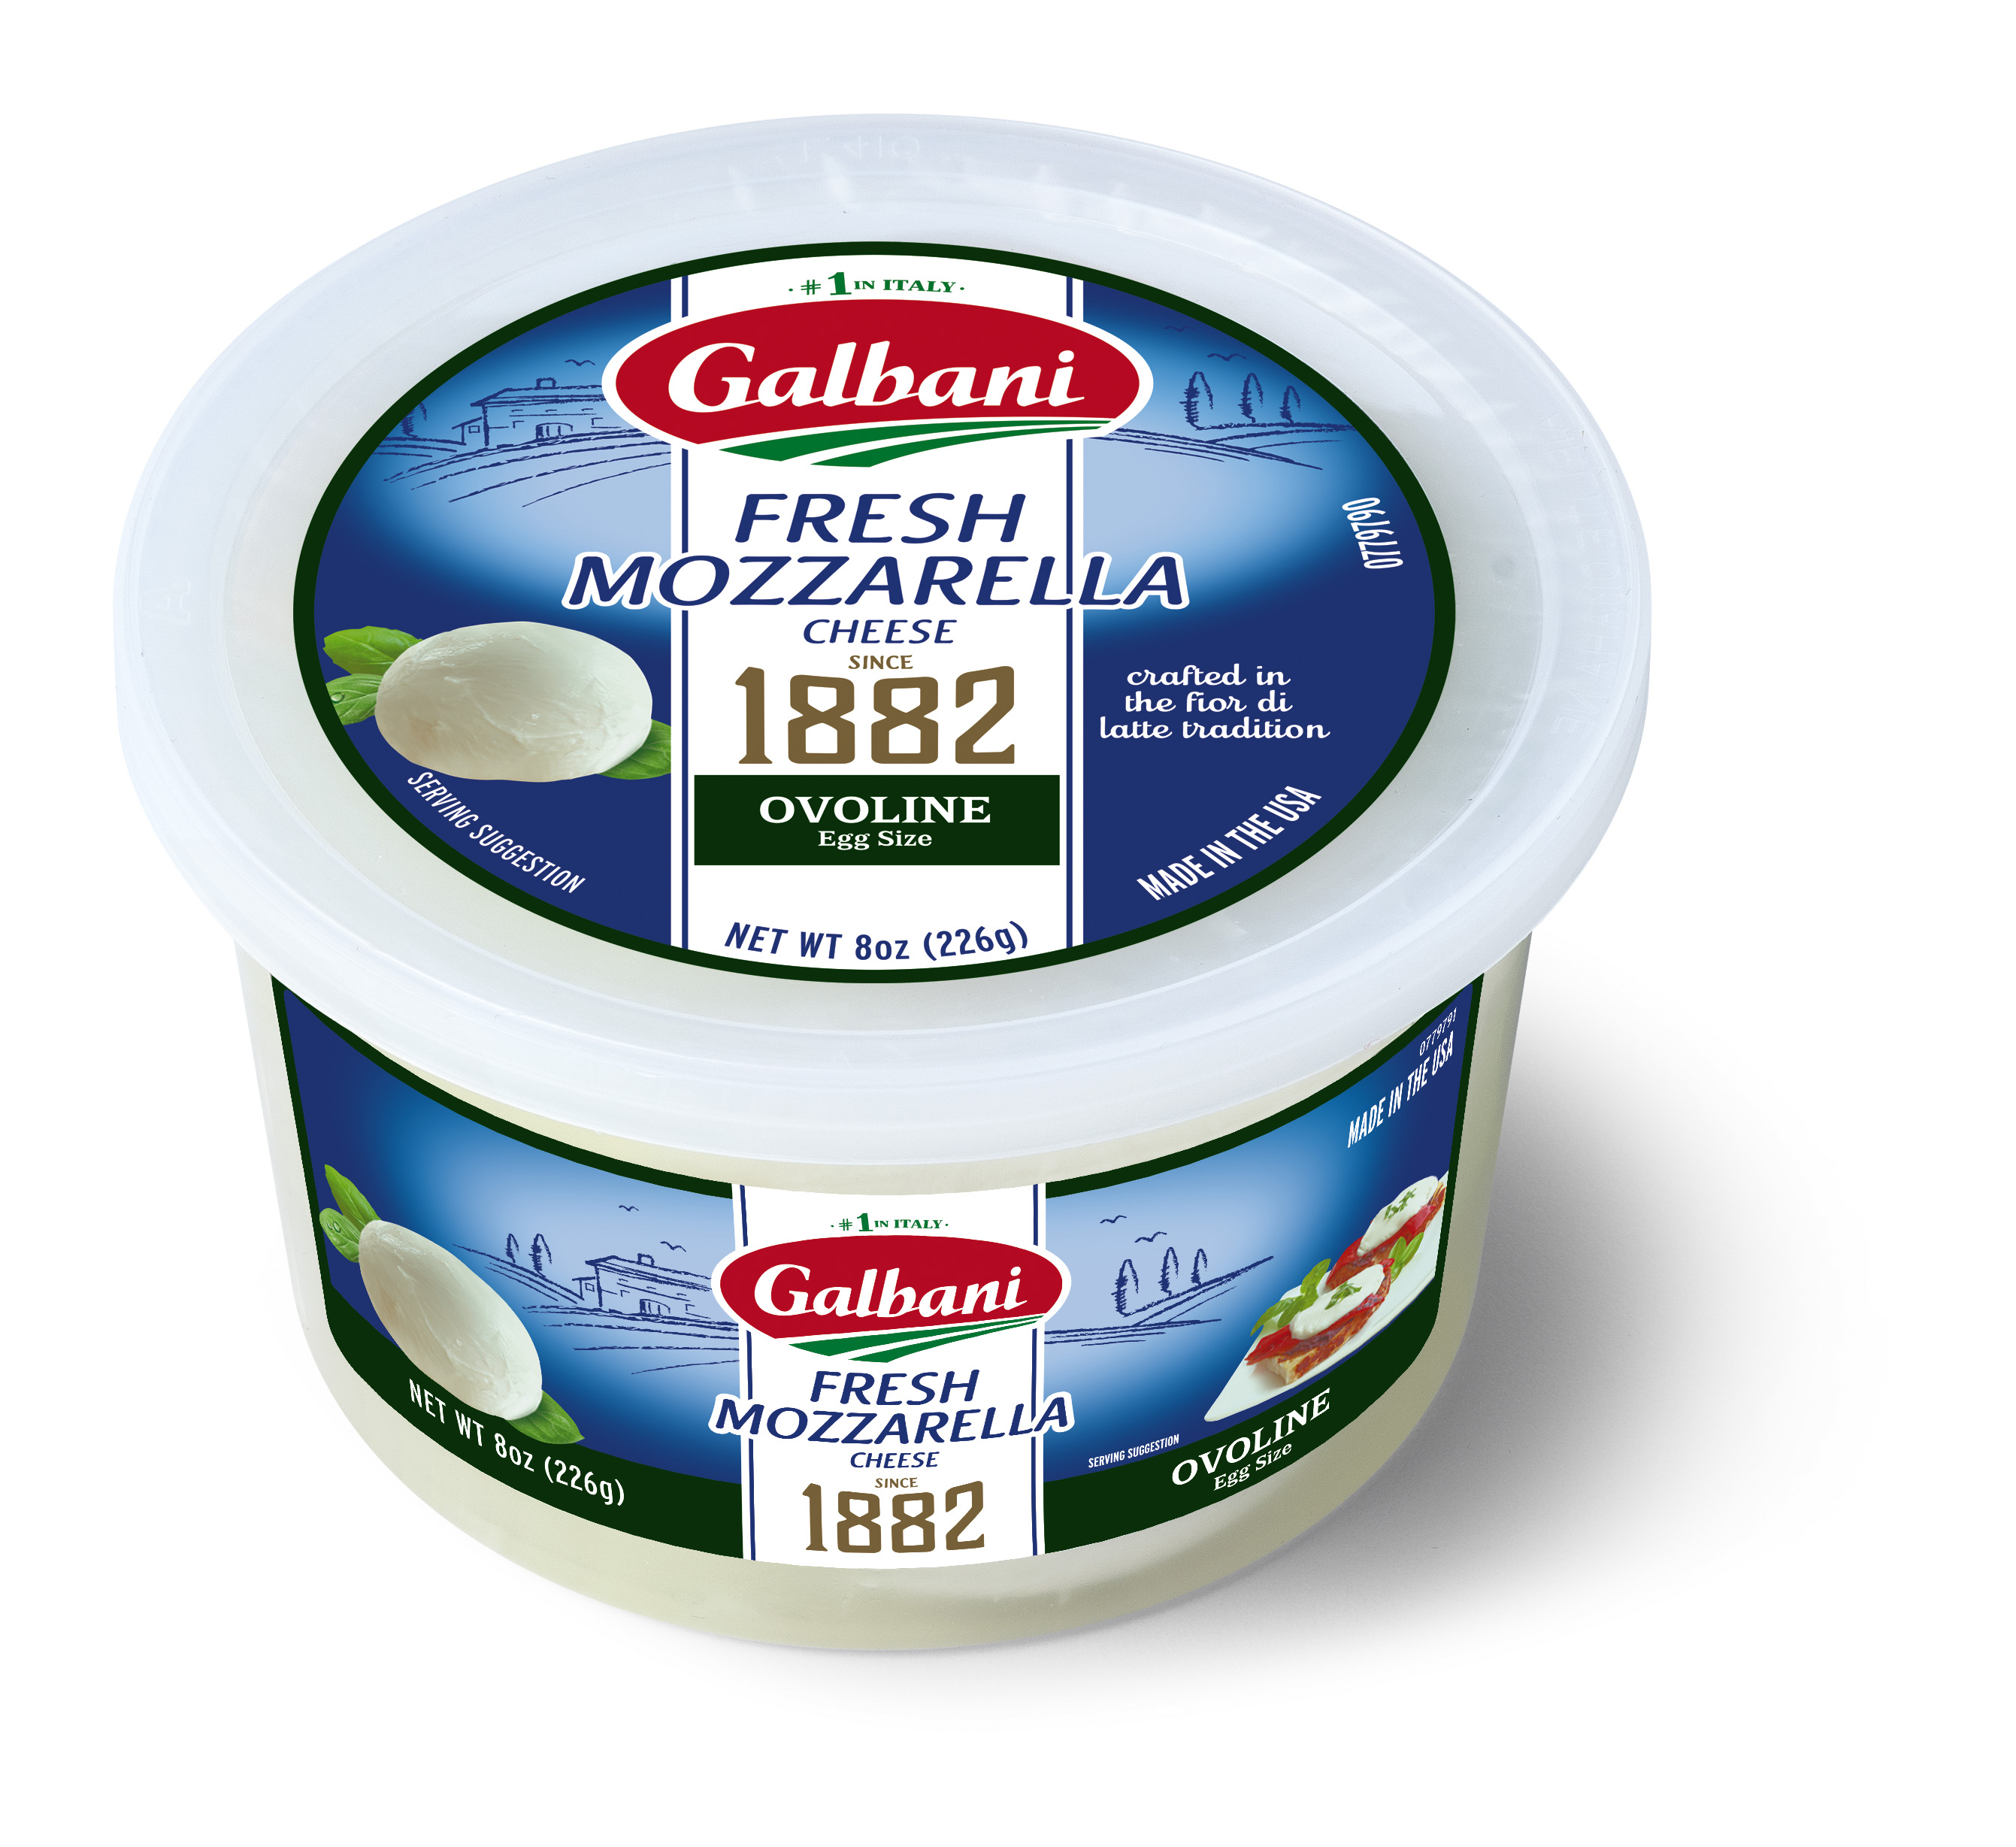 Fresh Mozzarella Ovoline - Galbani Cheese